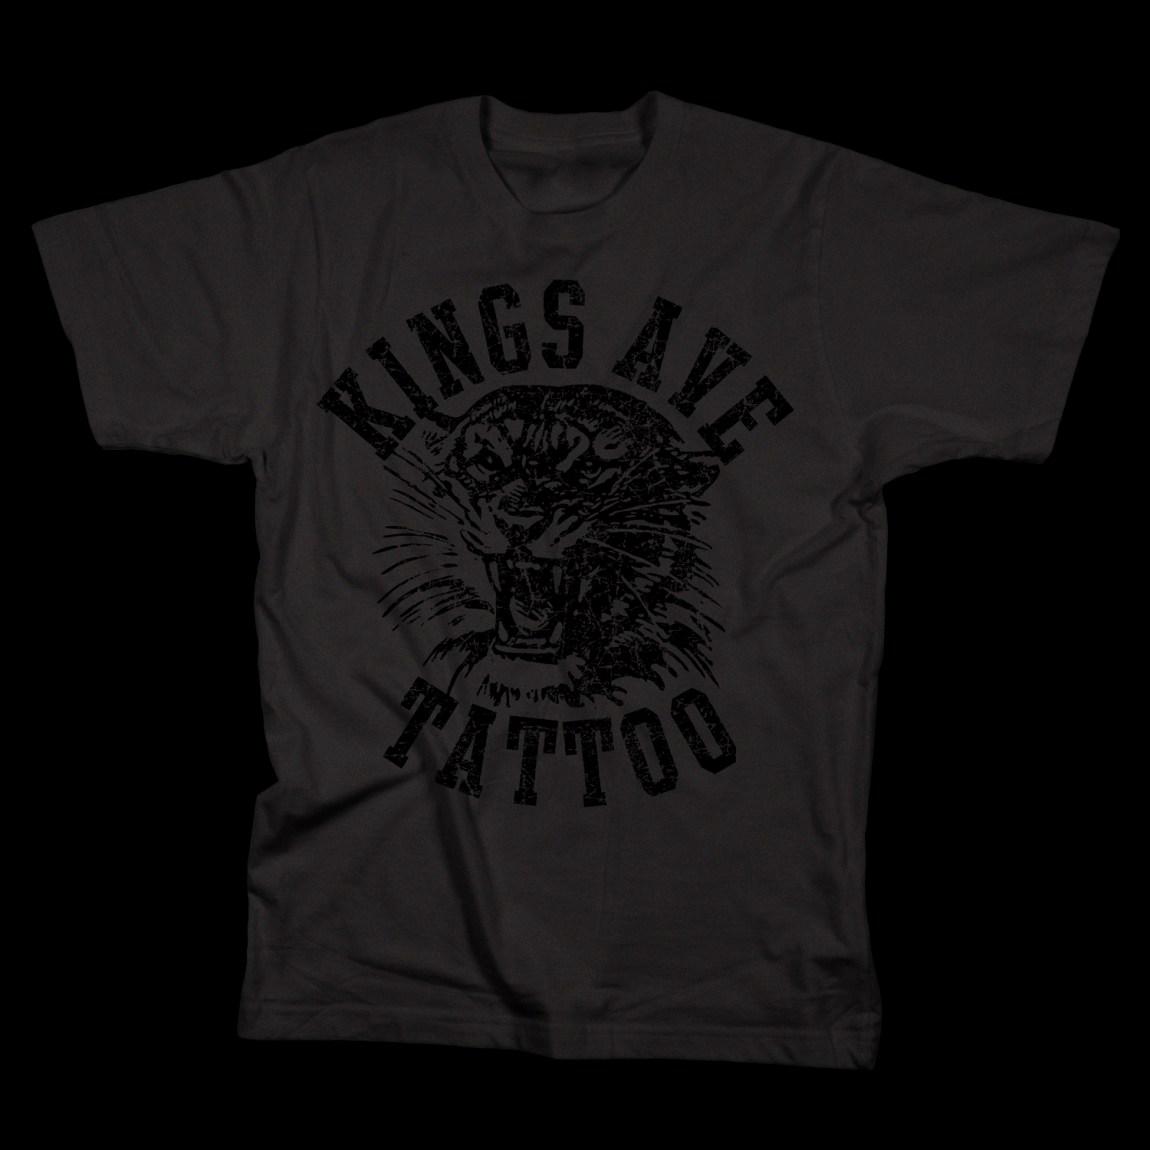 KA Tiger T-Shirt: Black 00011